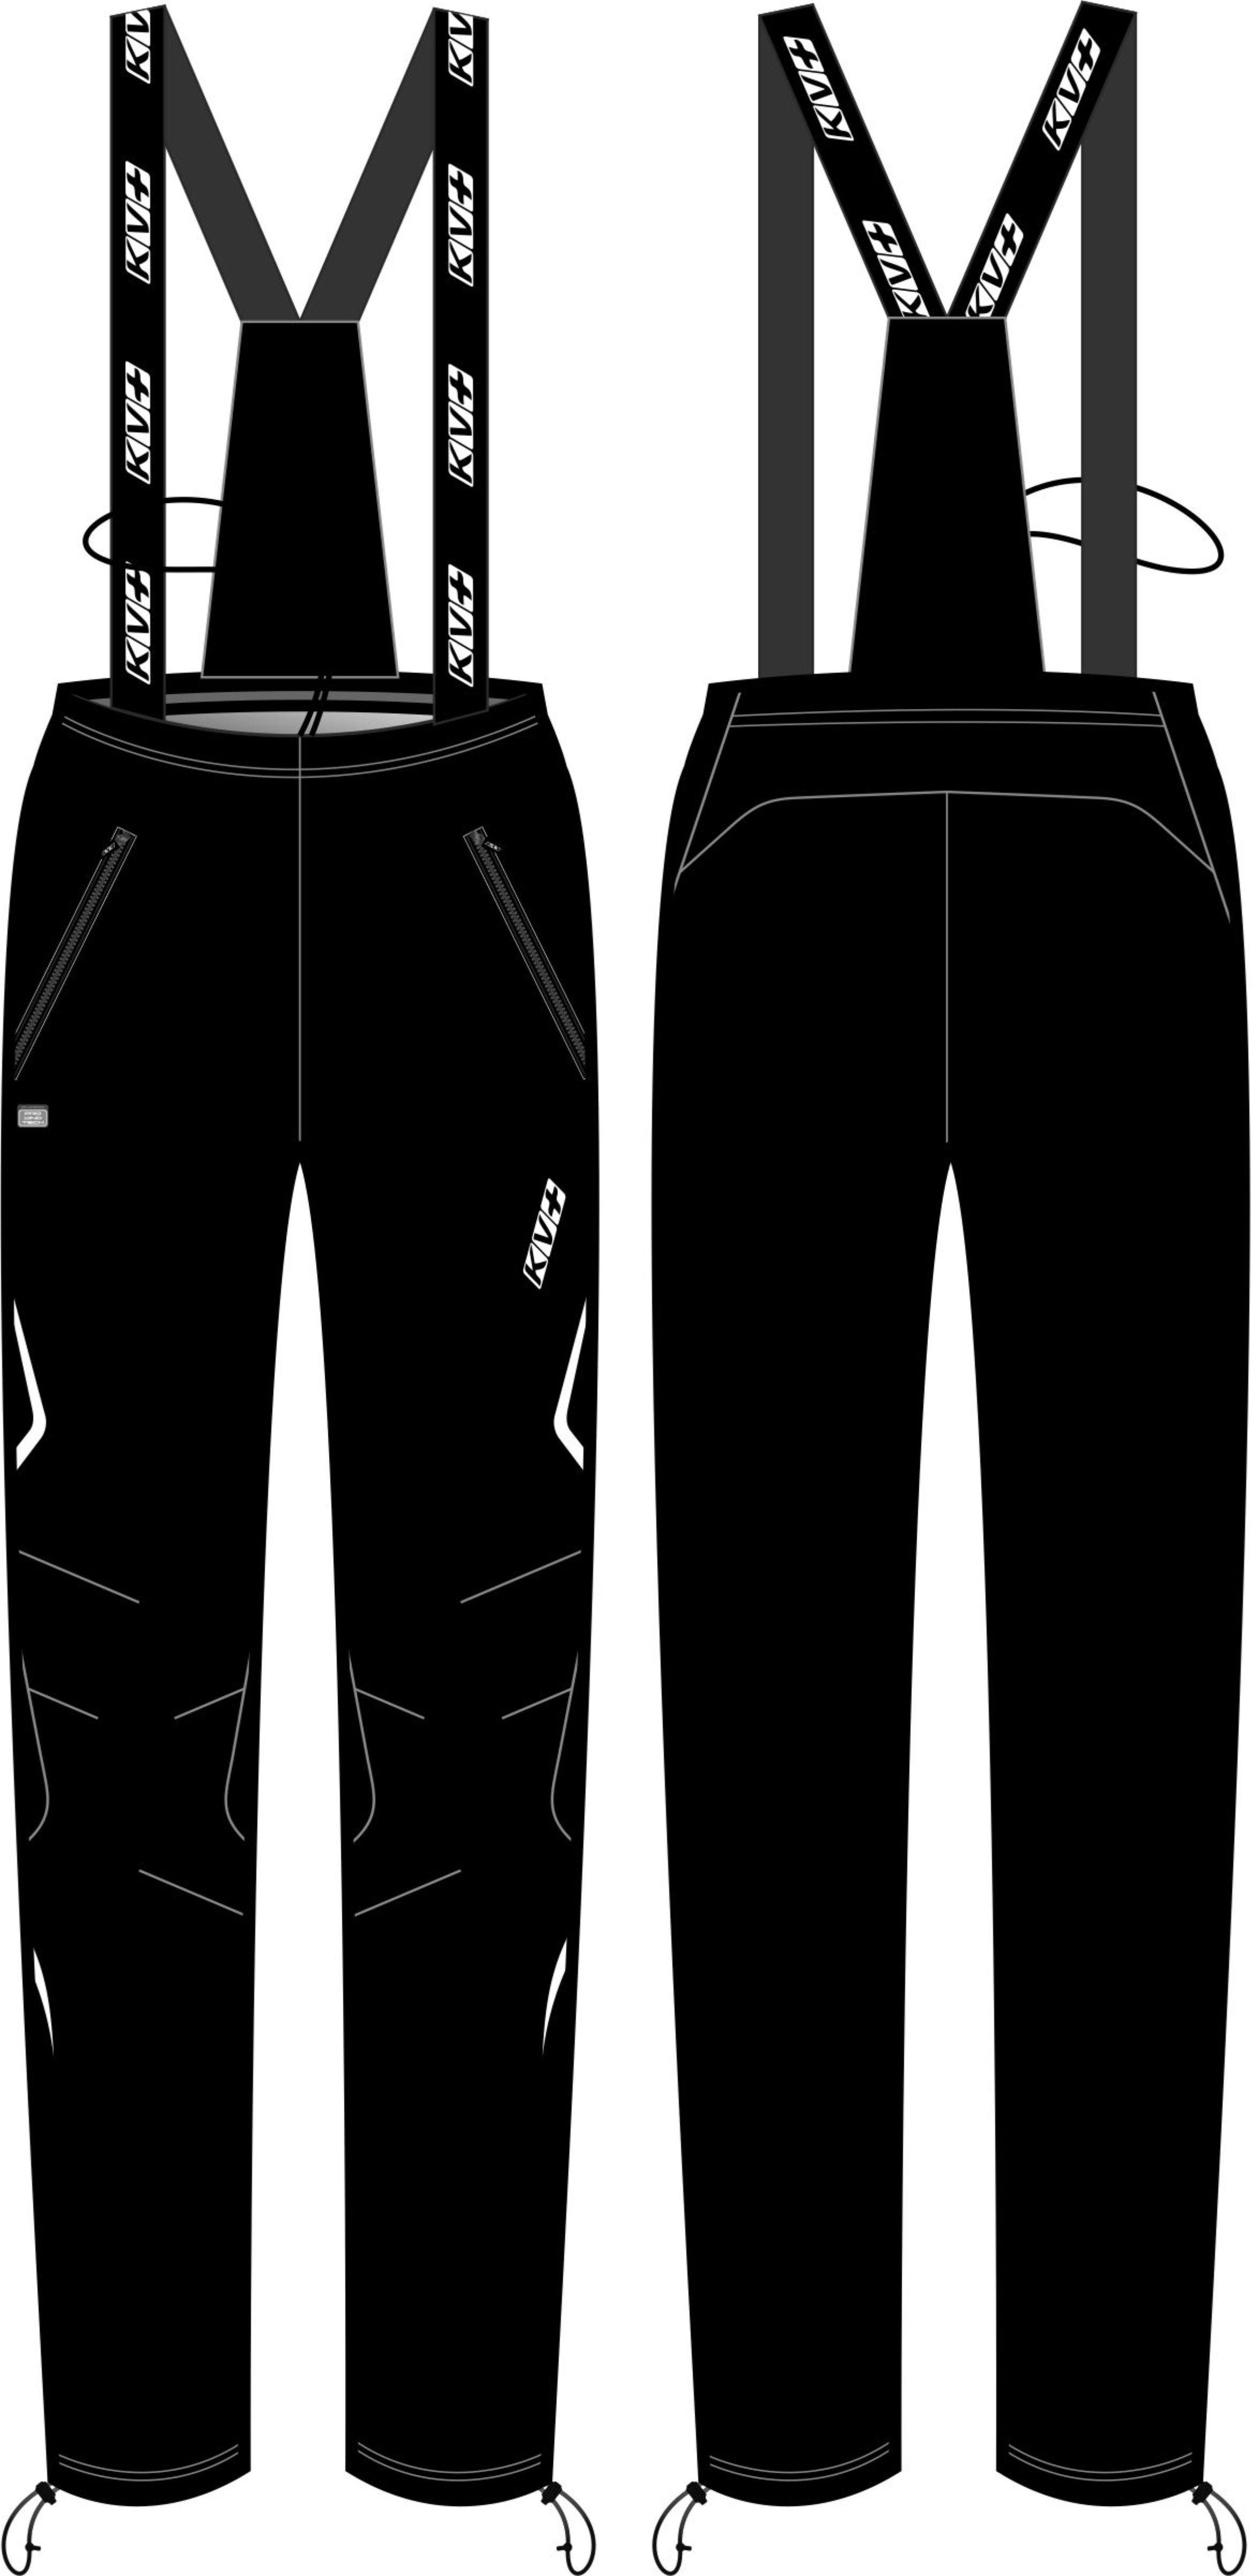 CROSS PANTS UNISEX bib & brace (black)